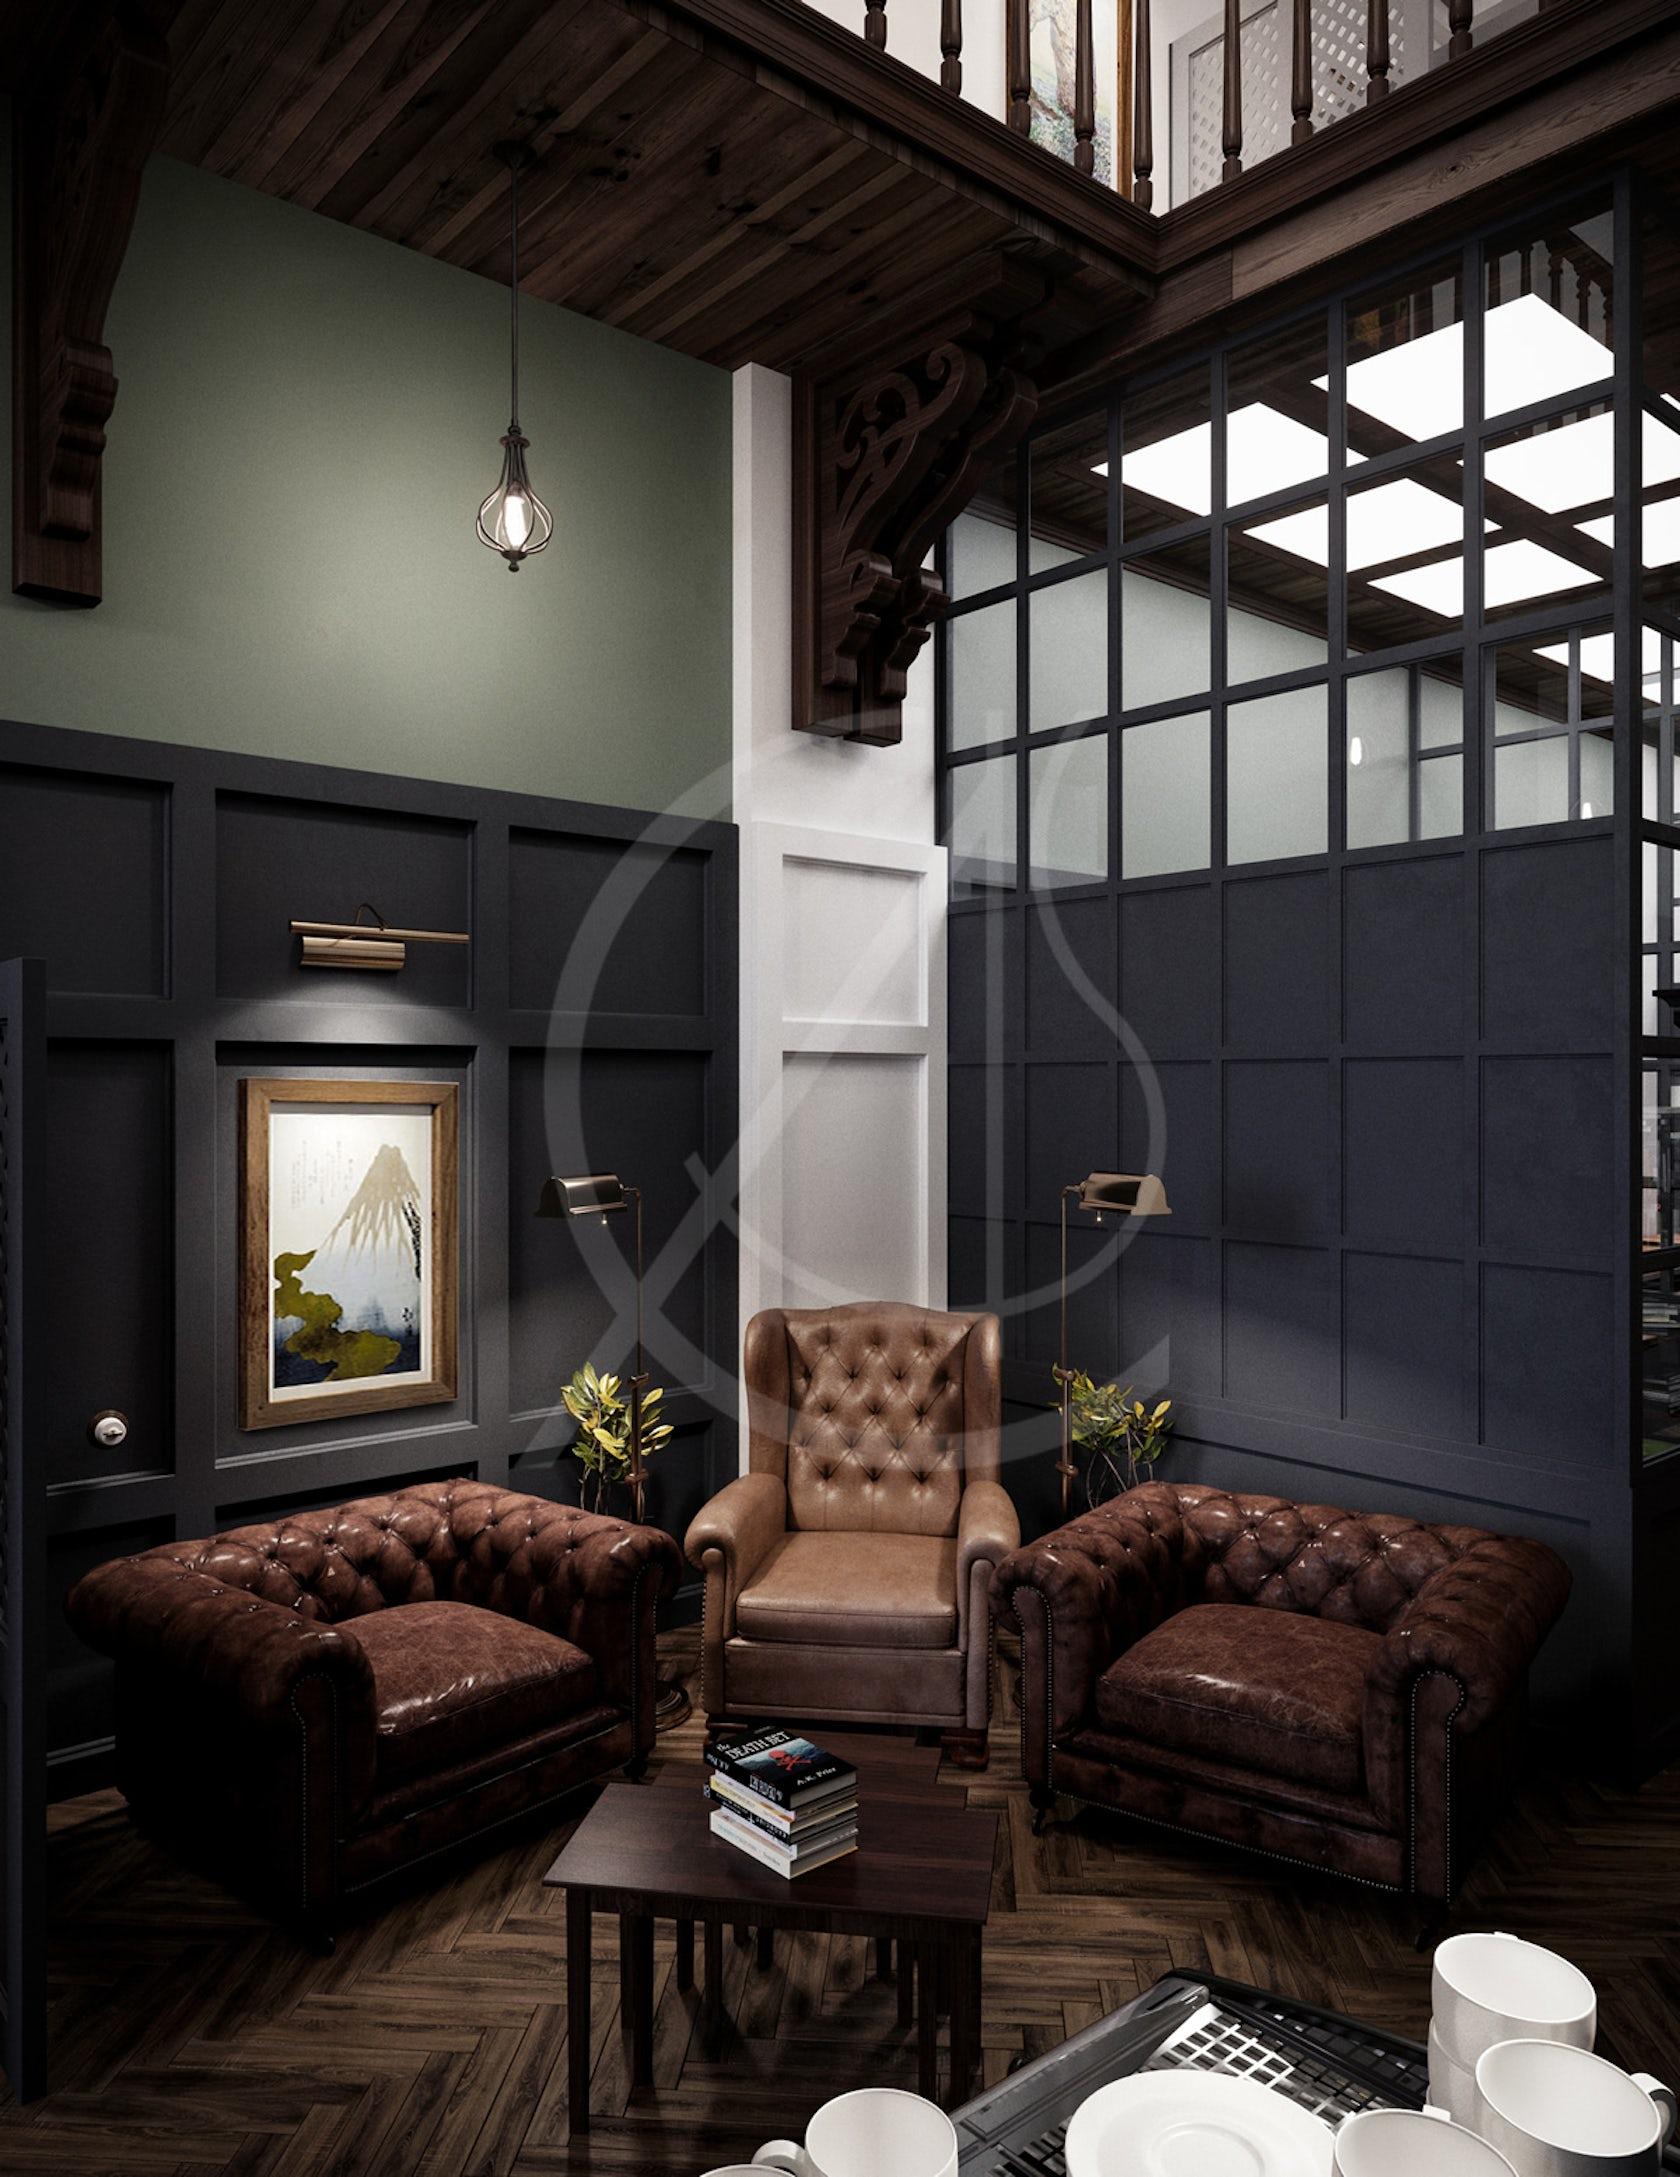 Student Cafe Design on Architizer